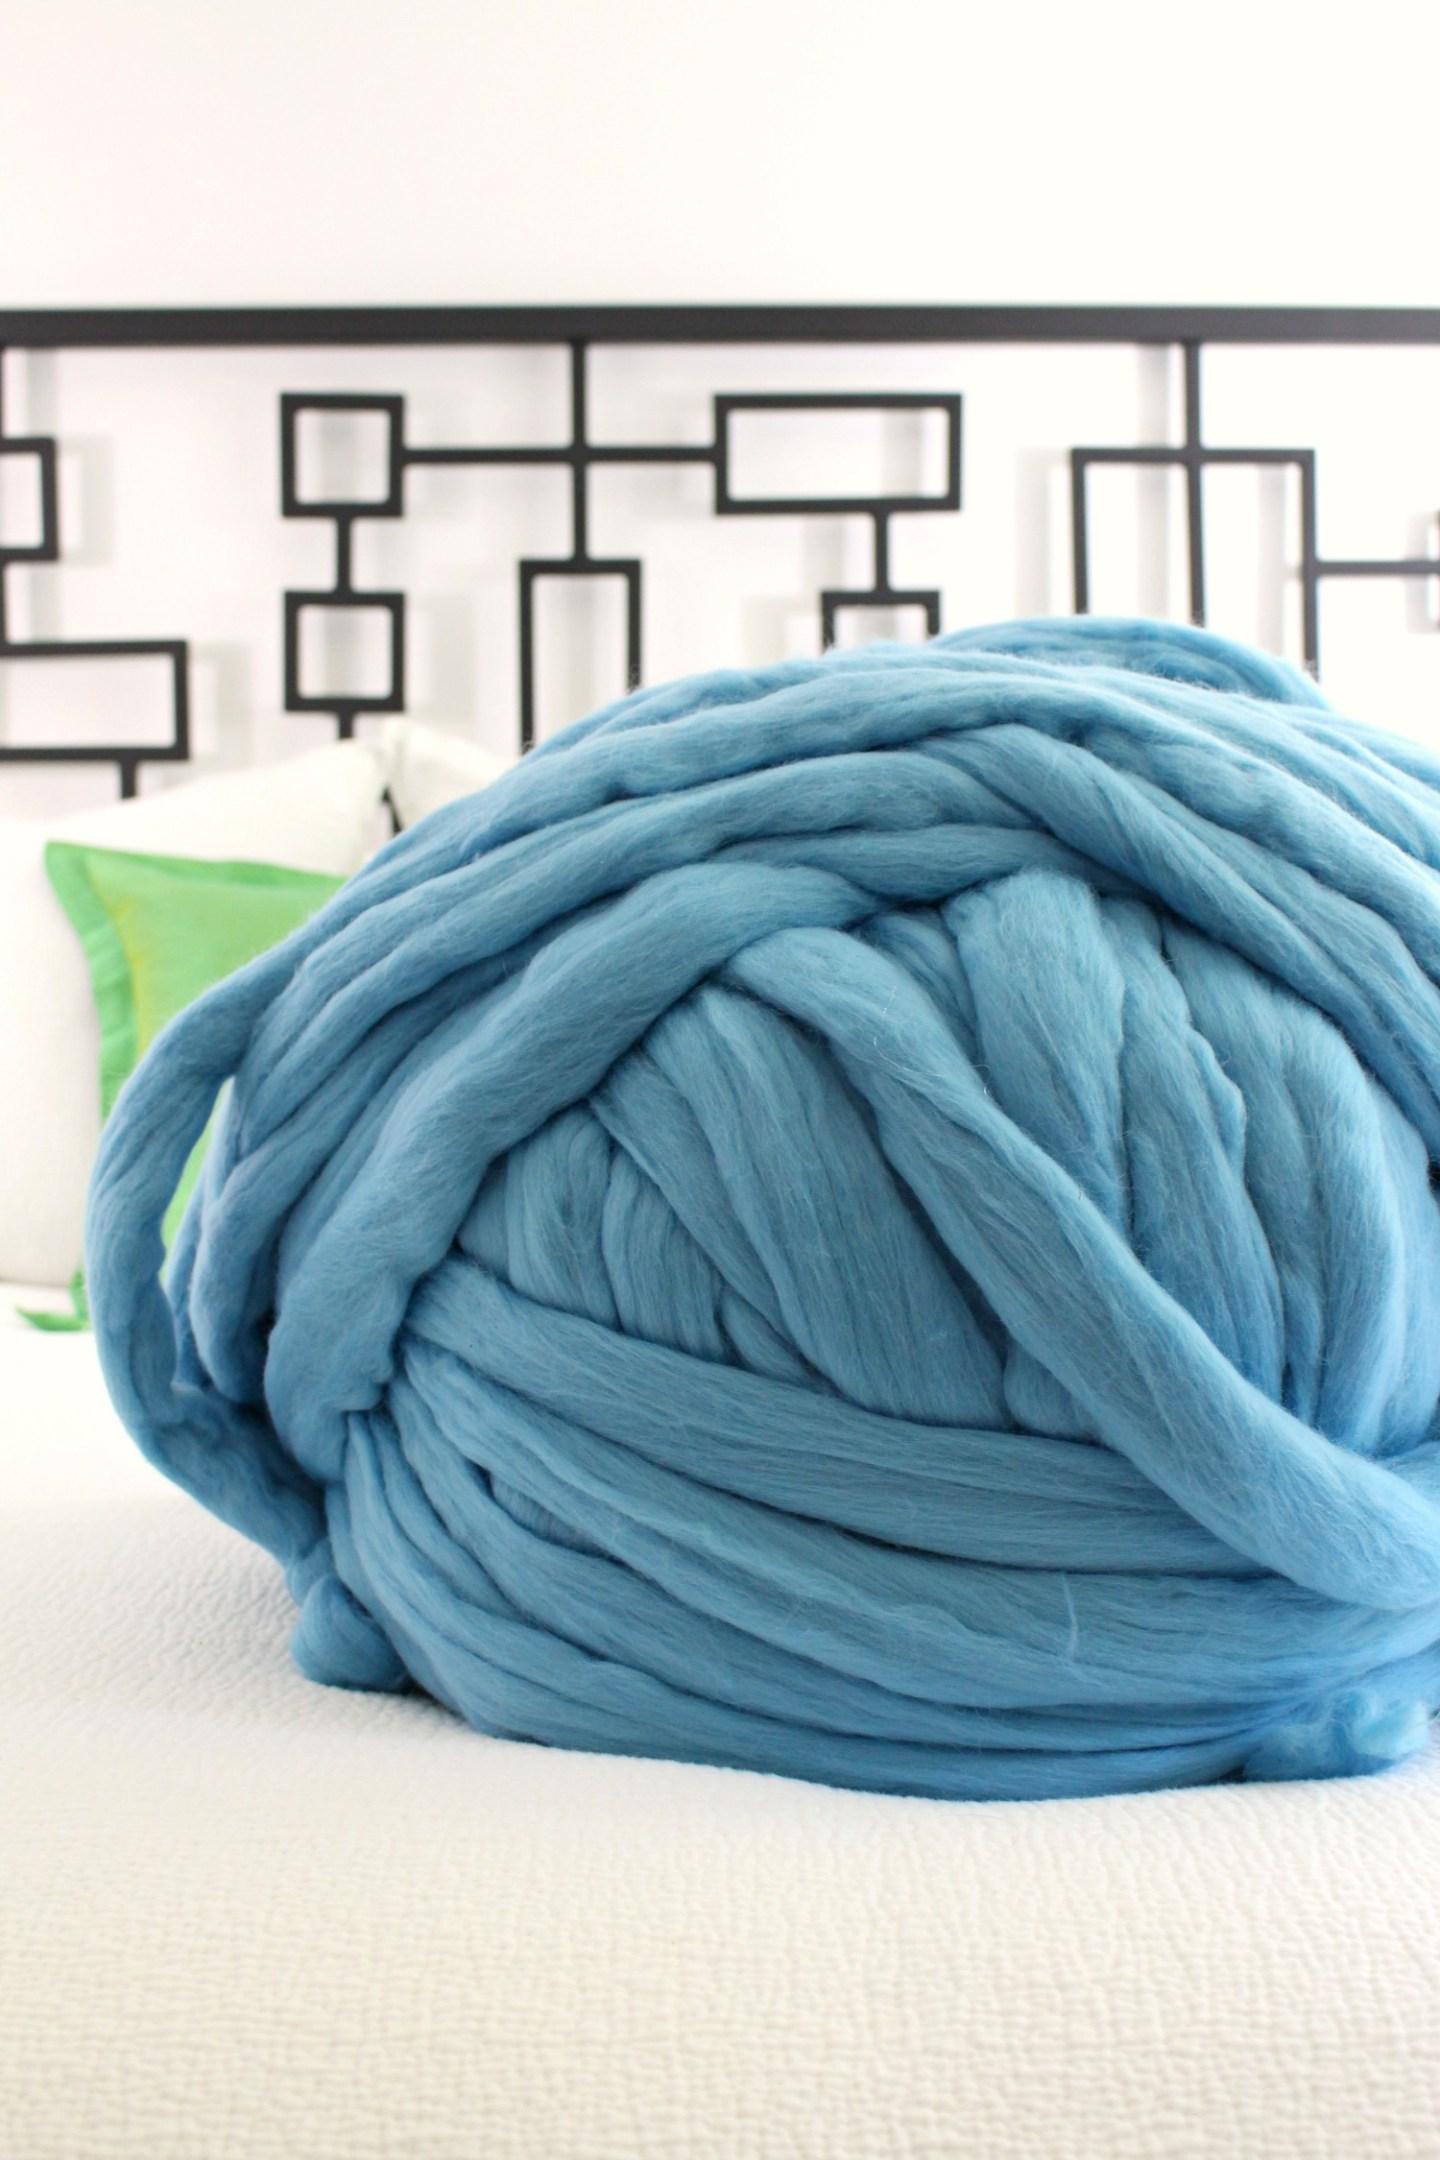 8lb ball of wool